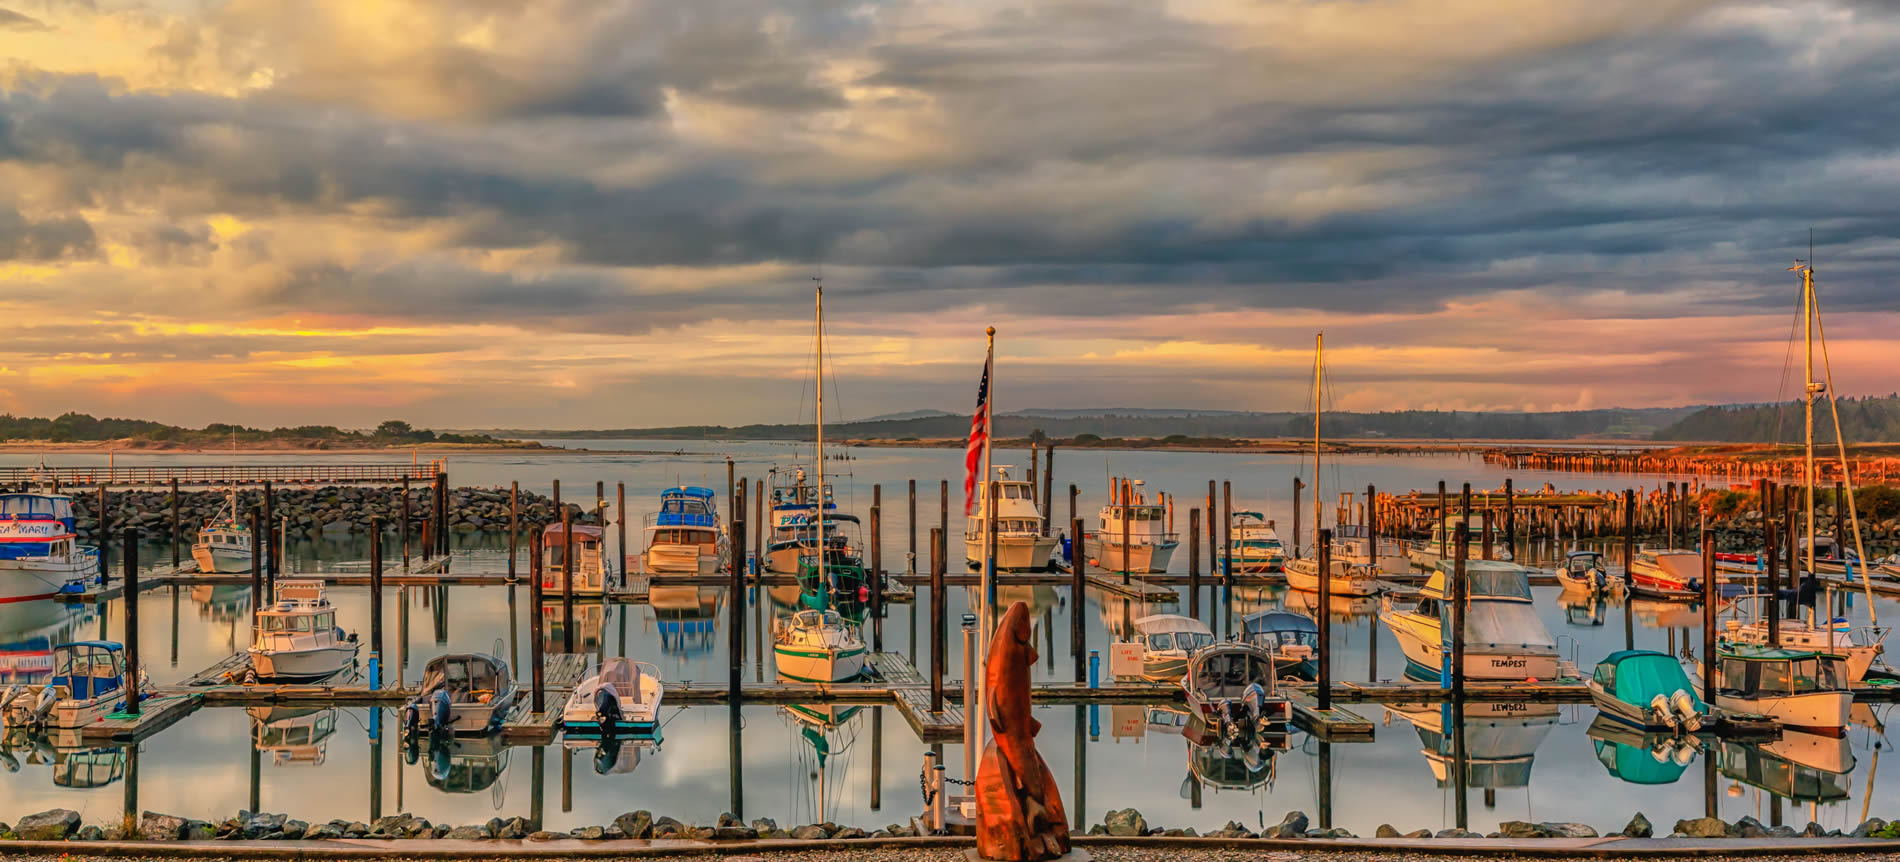 bandon oregon harbor with boats